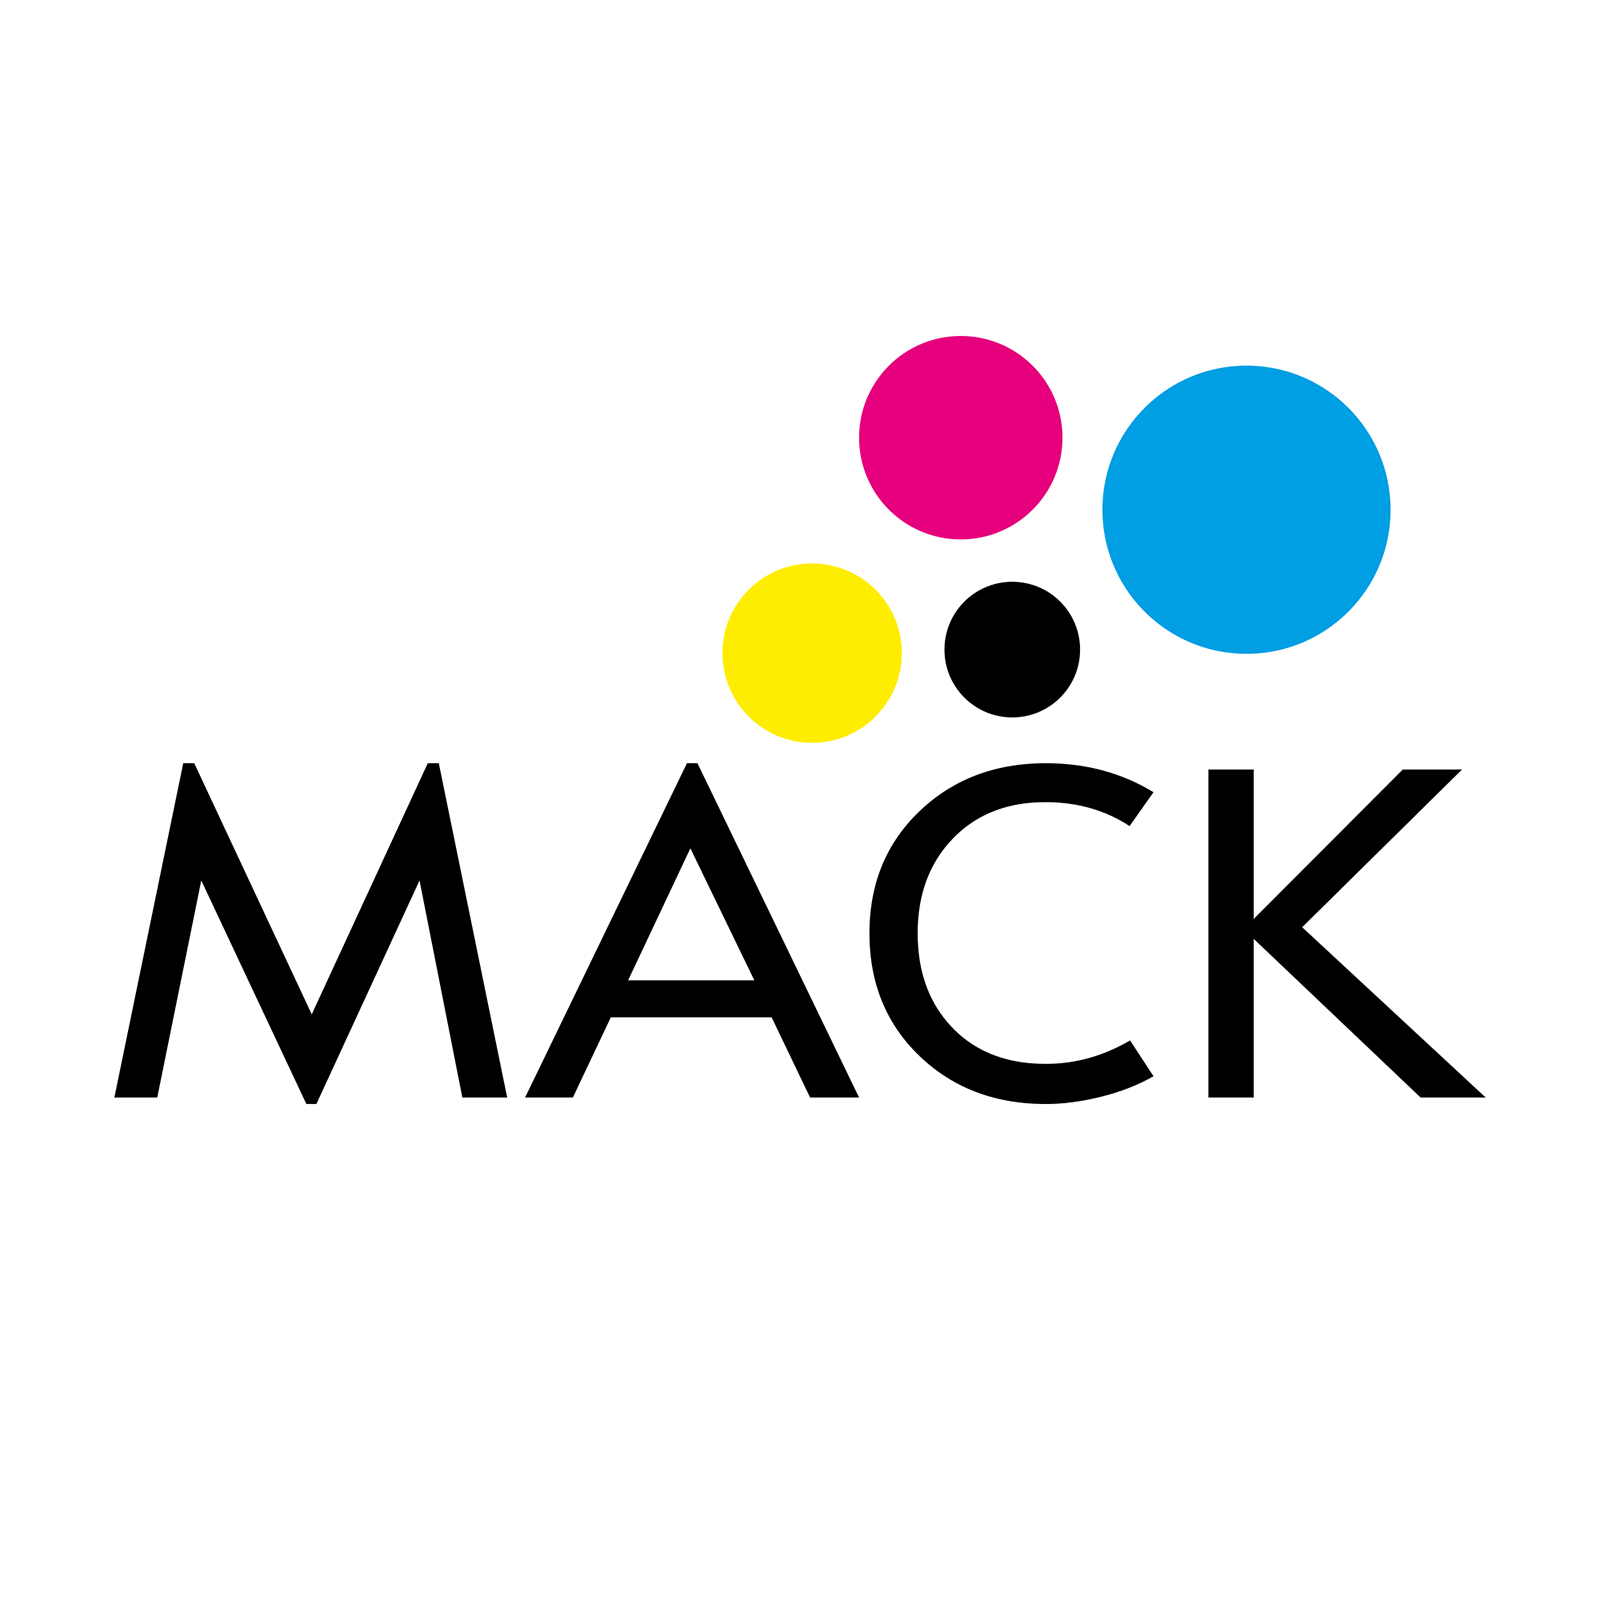 mack_logo_1600x1600_100